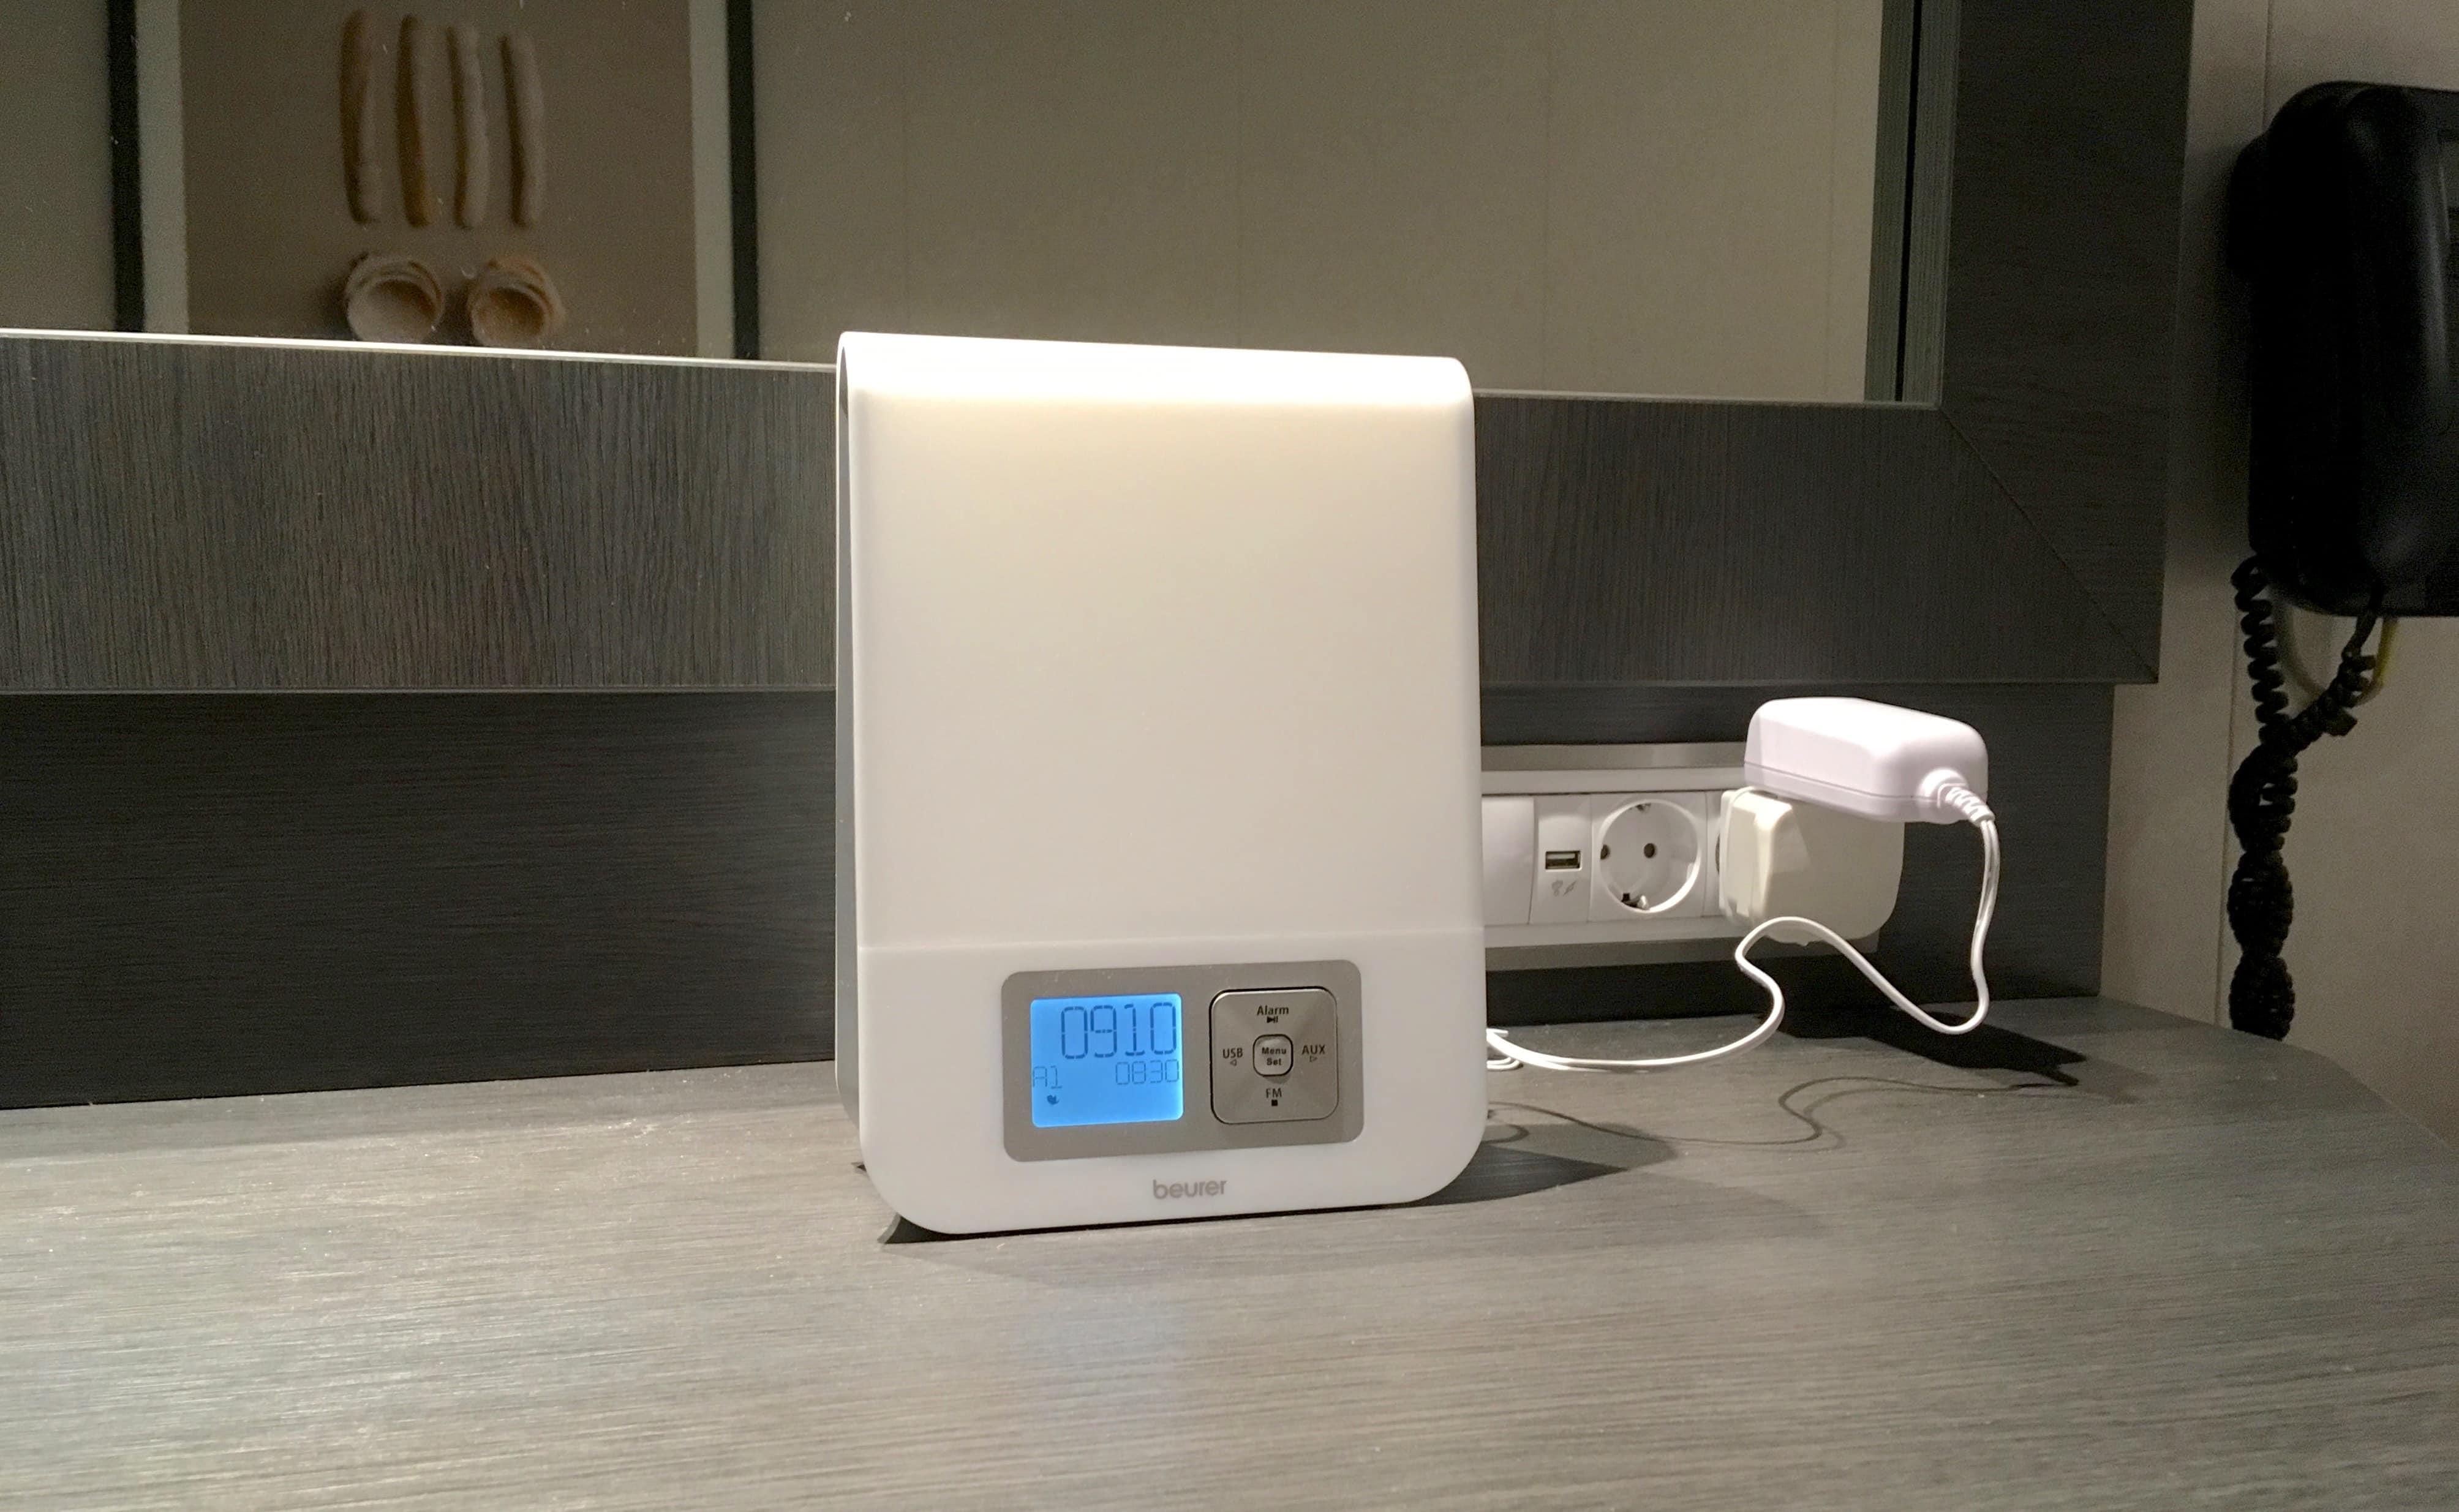 beurer wl80 wake up lamp review